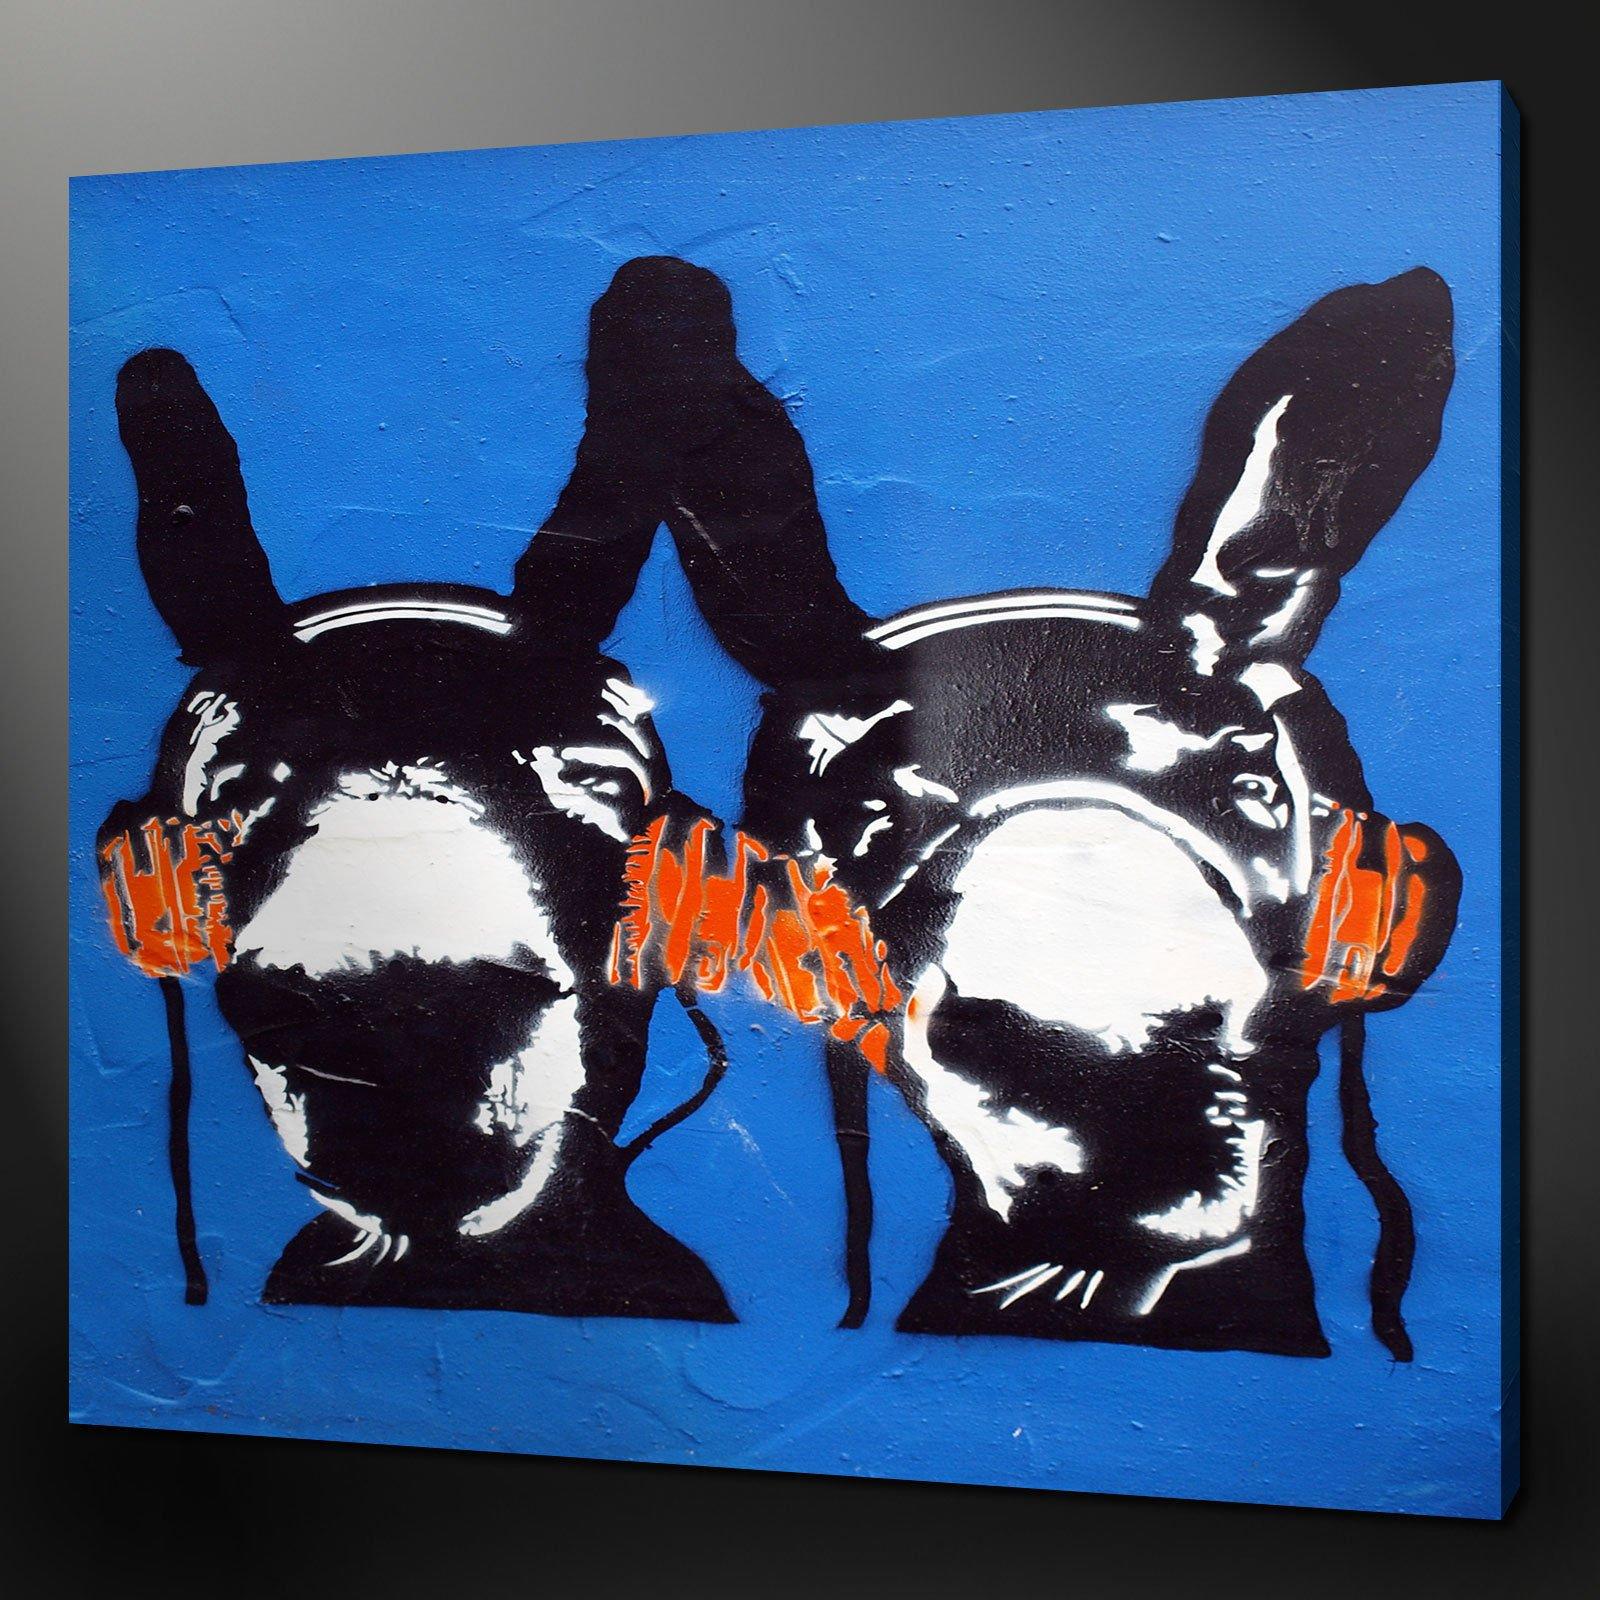 Donkey dj music funky modern design canvas print art 12x12 free uk pp